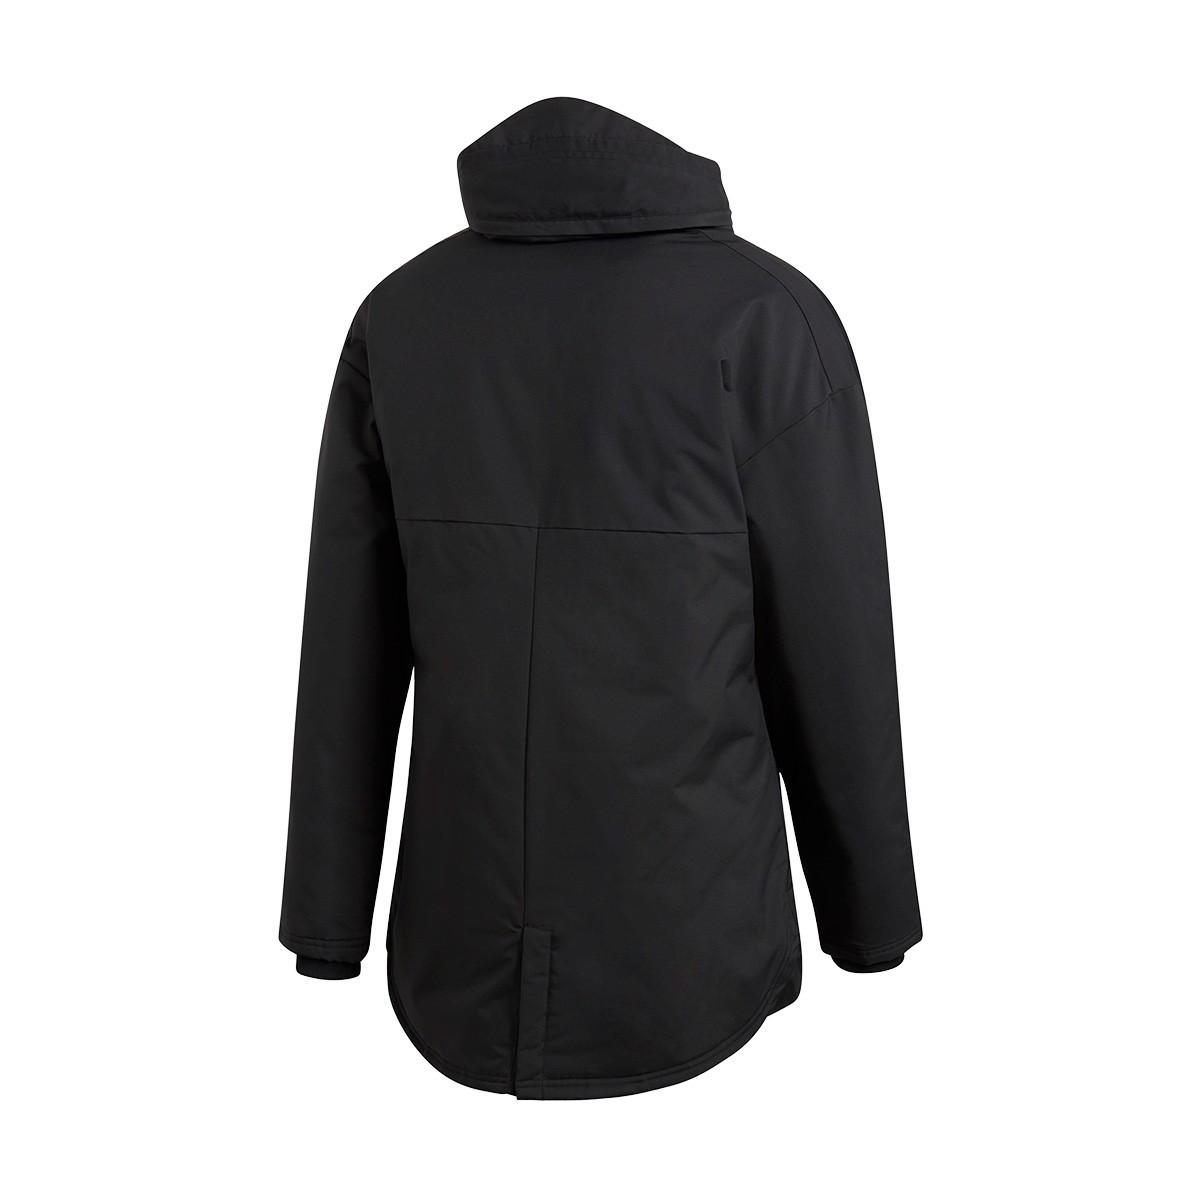 32fdd2ca7e61 Coat adidas Condivo 18 Stadium Parka Black-White - Tienda de fútbol Fútbol  Emotion